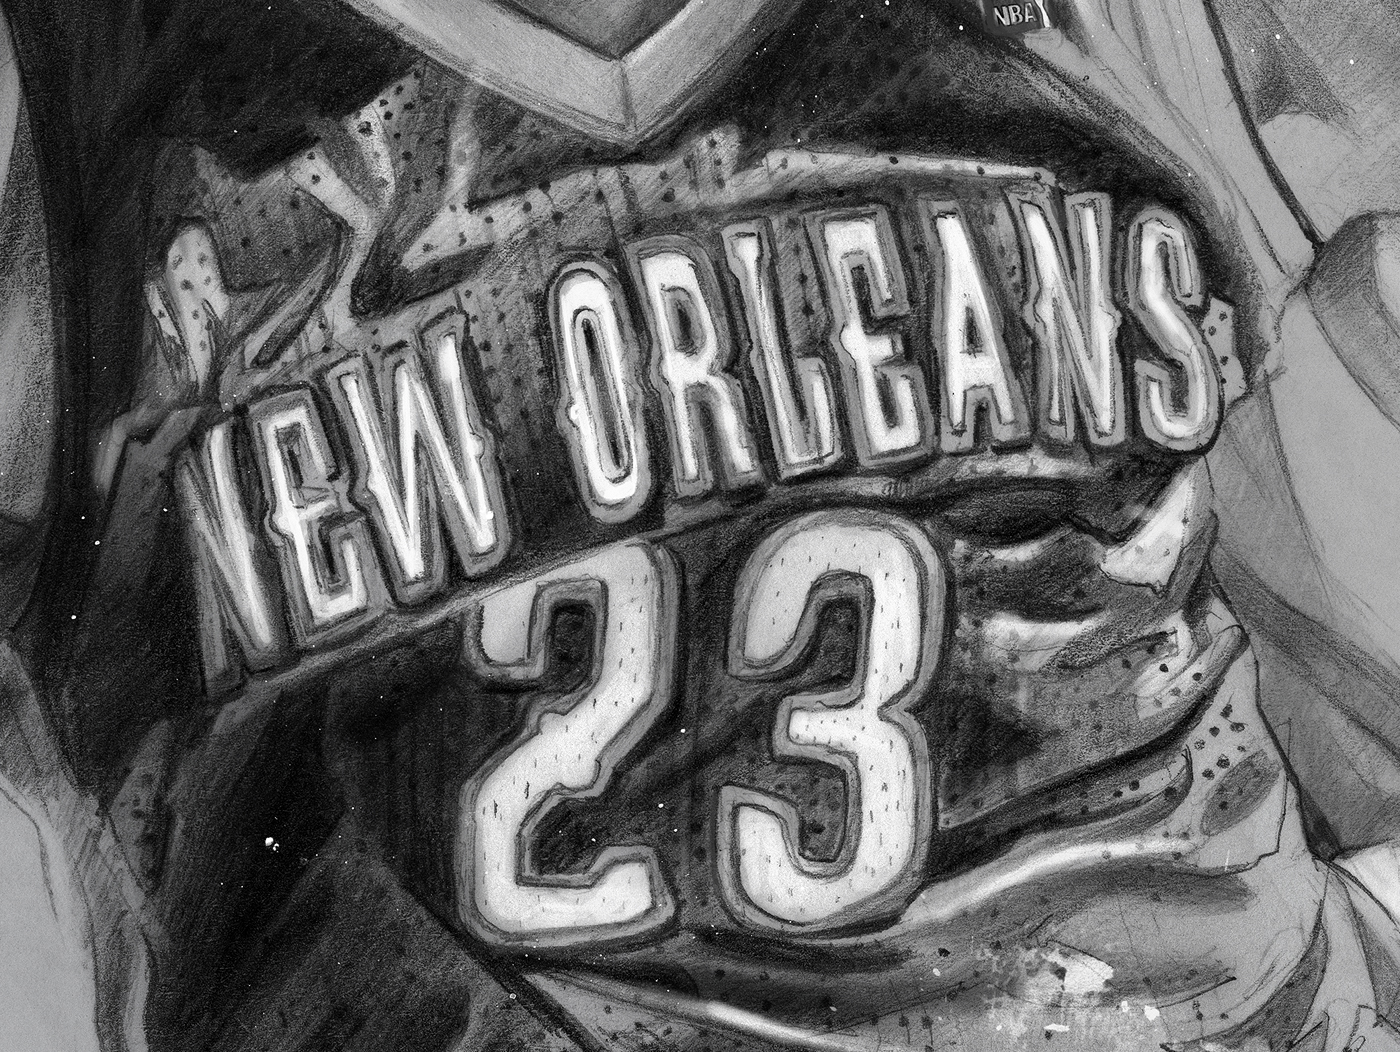 houseofhoops Nike footlocker slanginc NBA LeBron Playoffs ESPN